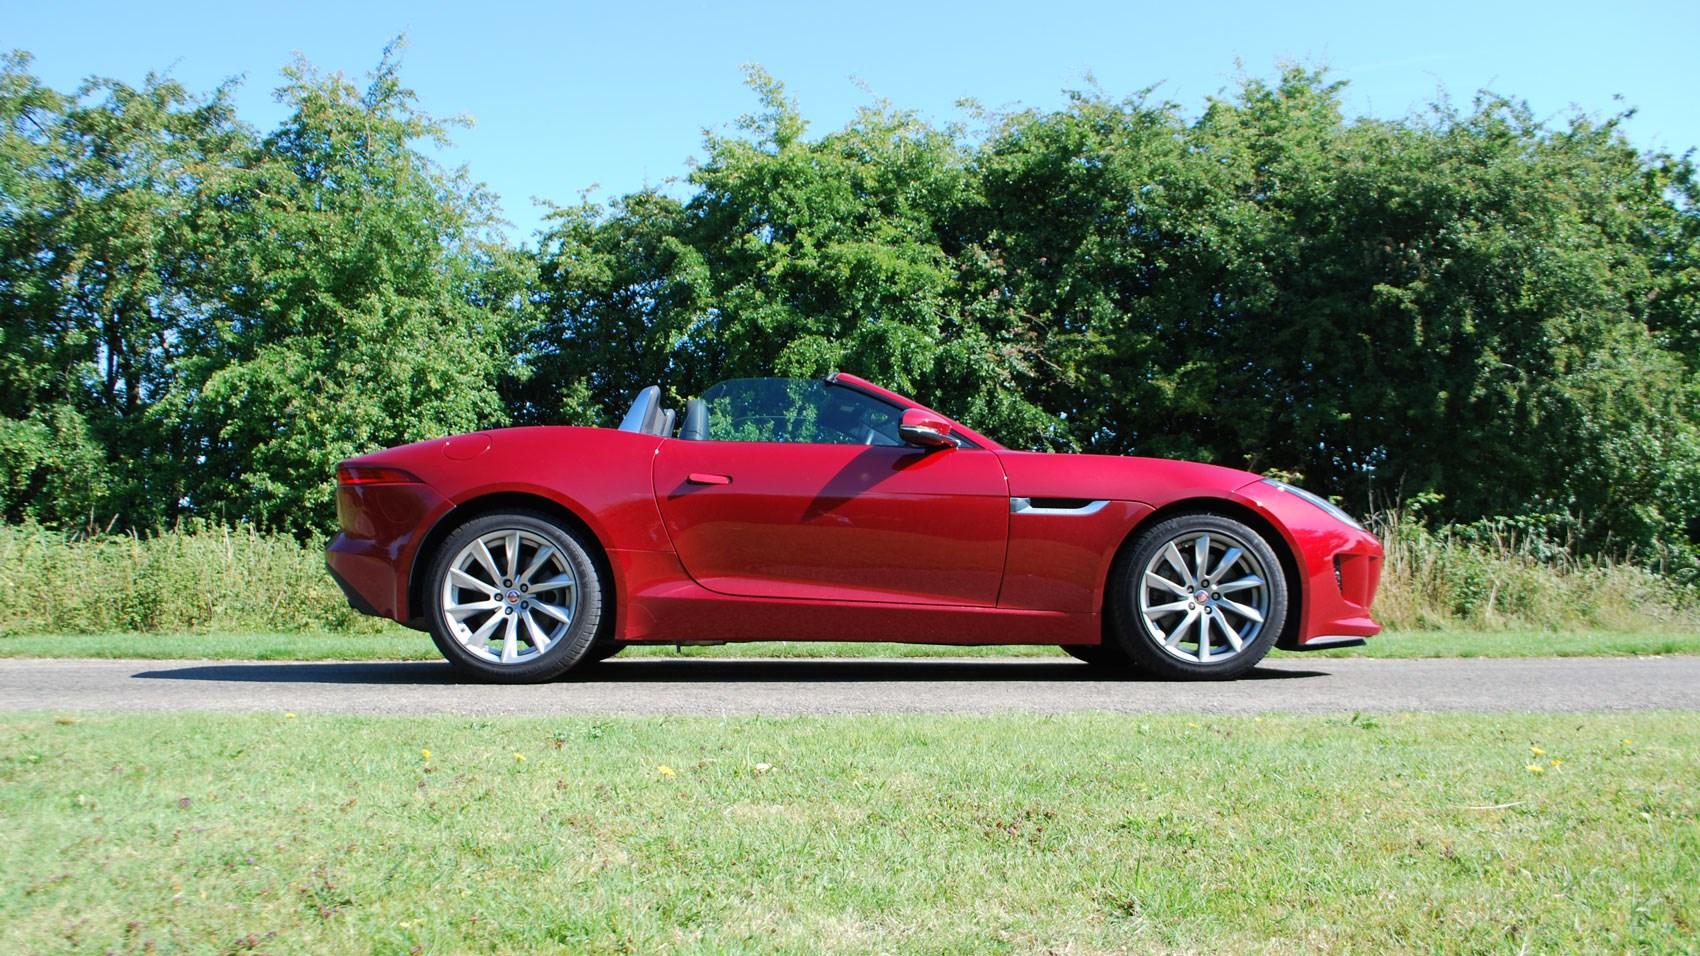 Jaguar F Type R Exhaust >> Jaguar F-type 3.0 V6 manual (2015) review | CAR Magazine